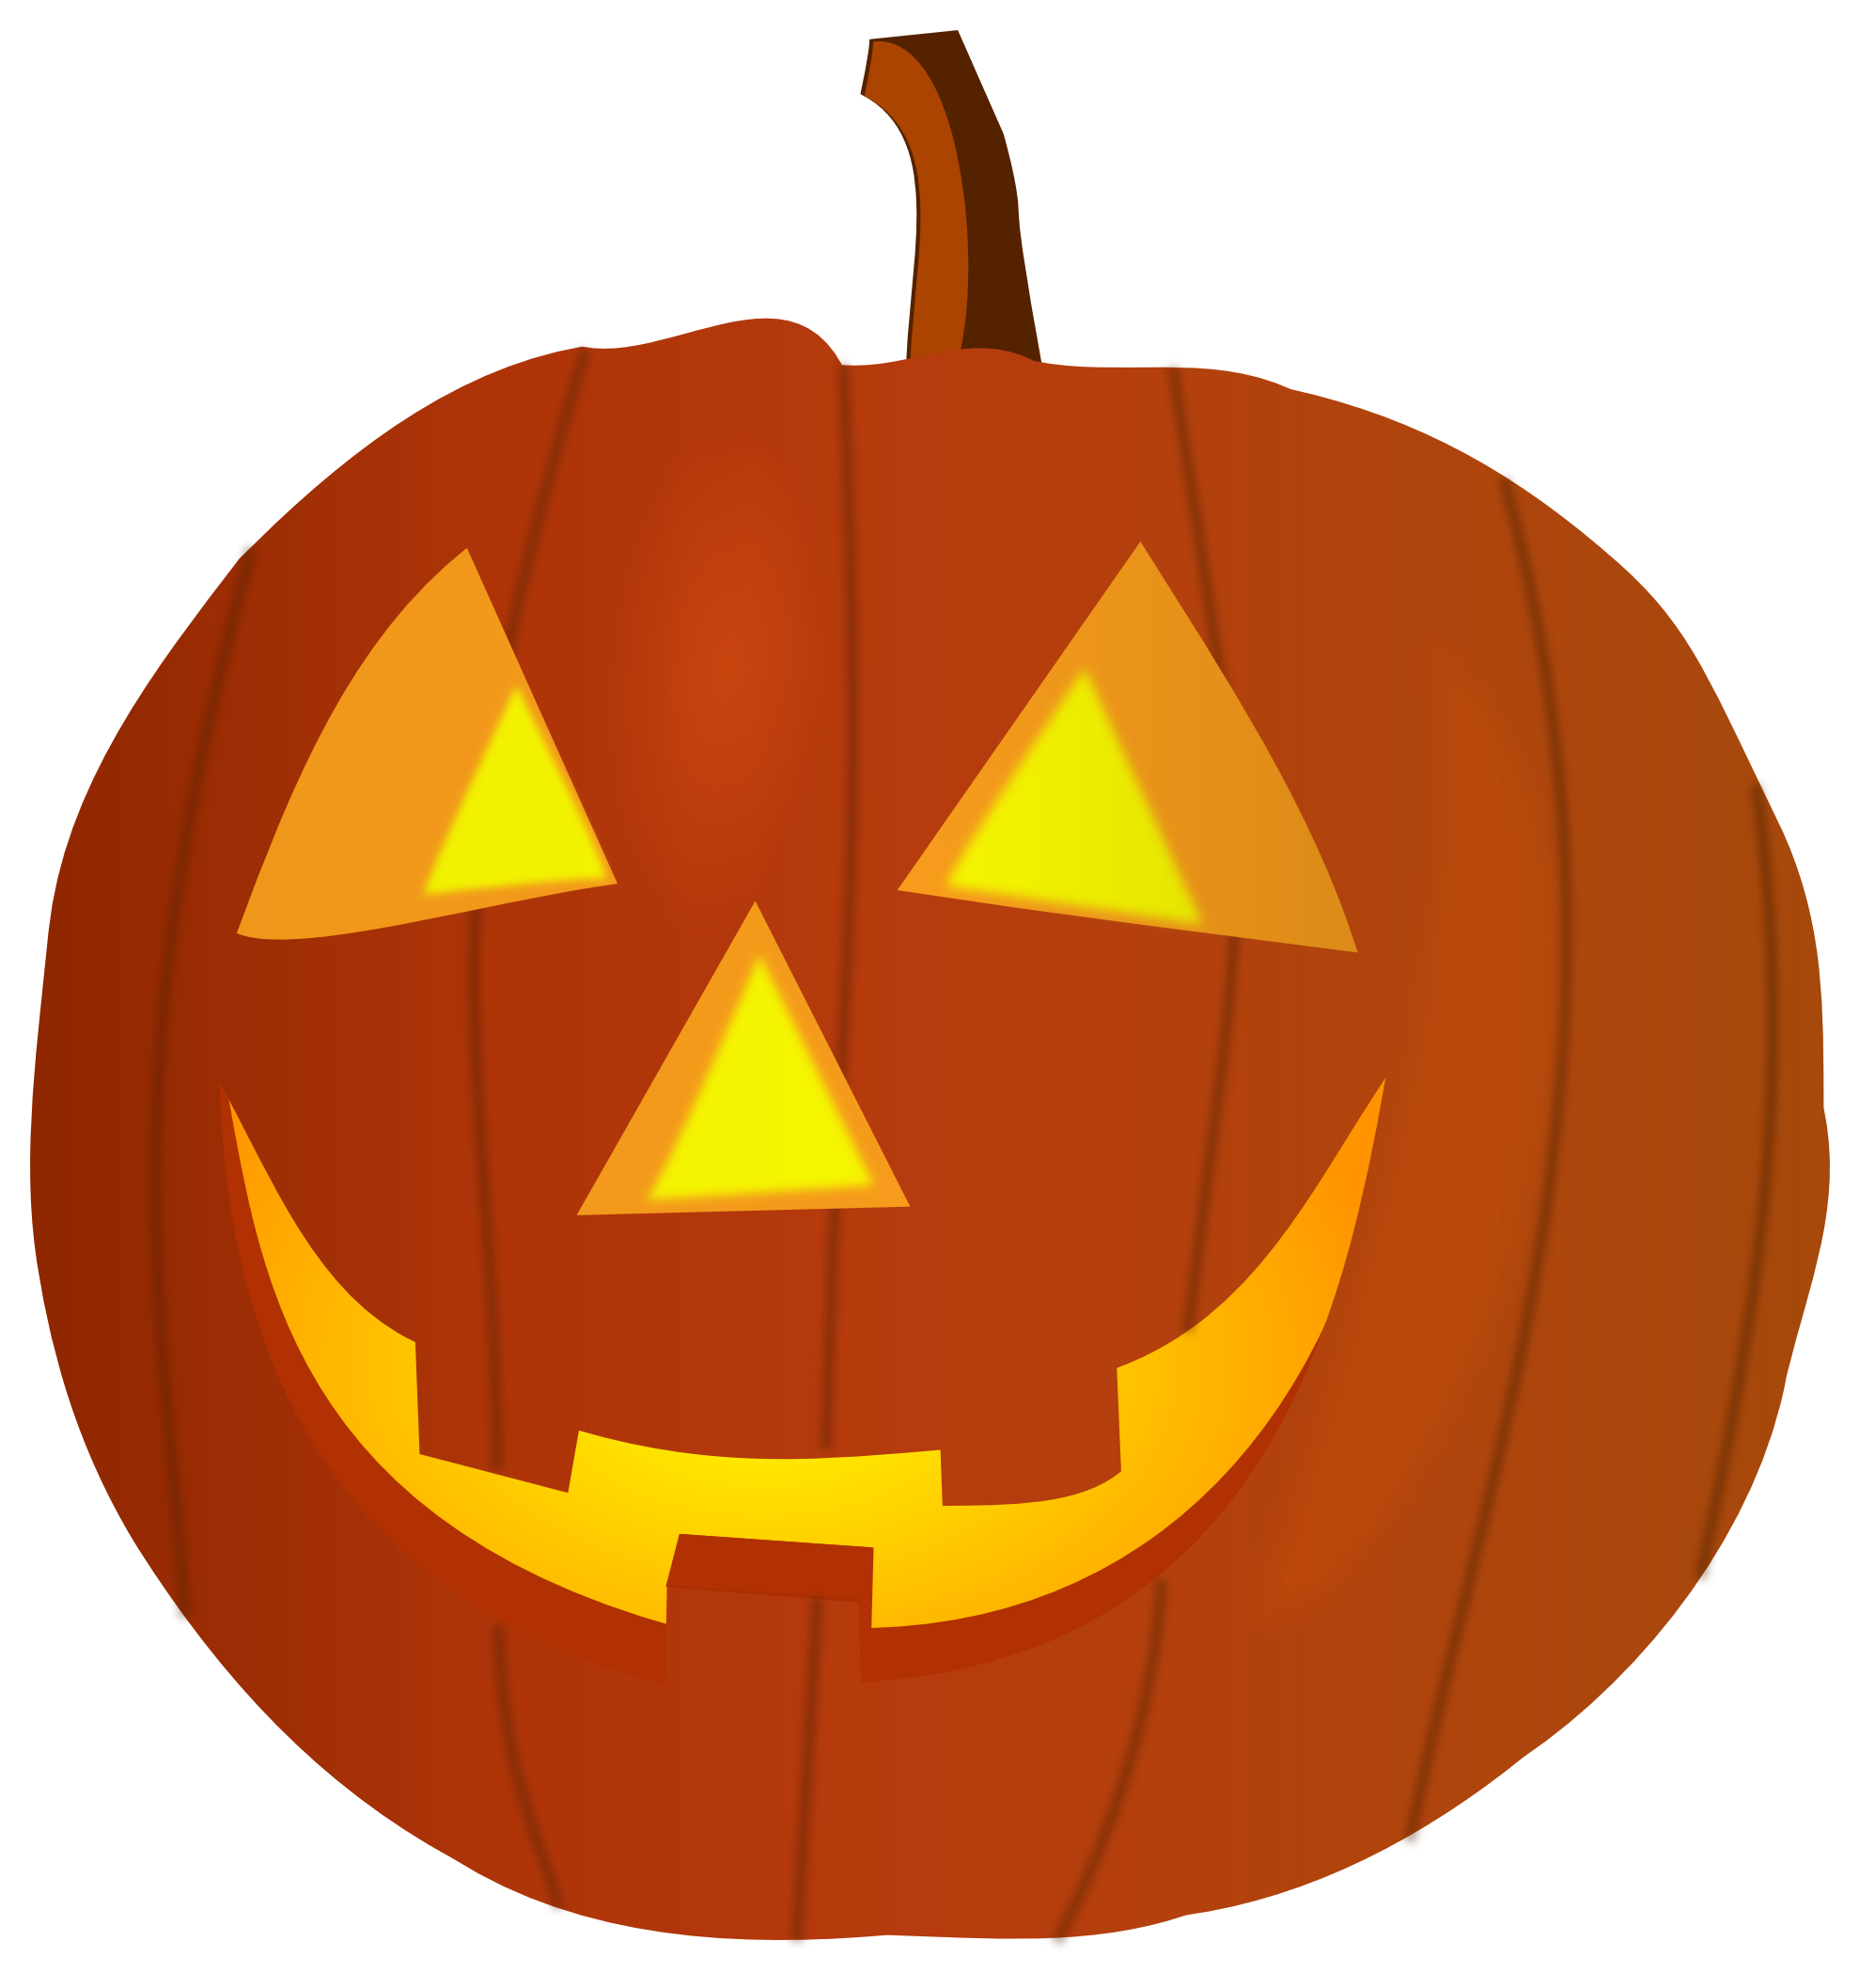 All saints day pumpkin clipart clipart free stock Kết quả hình ảnh cho pumptin vector | Pumpkin Carving Ideas ... clipart free stock